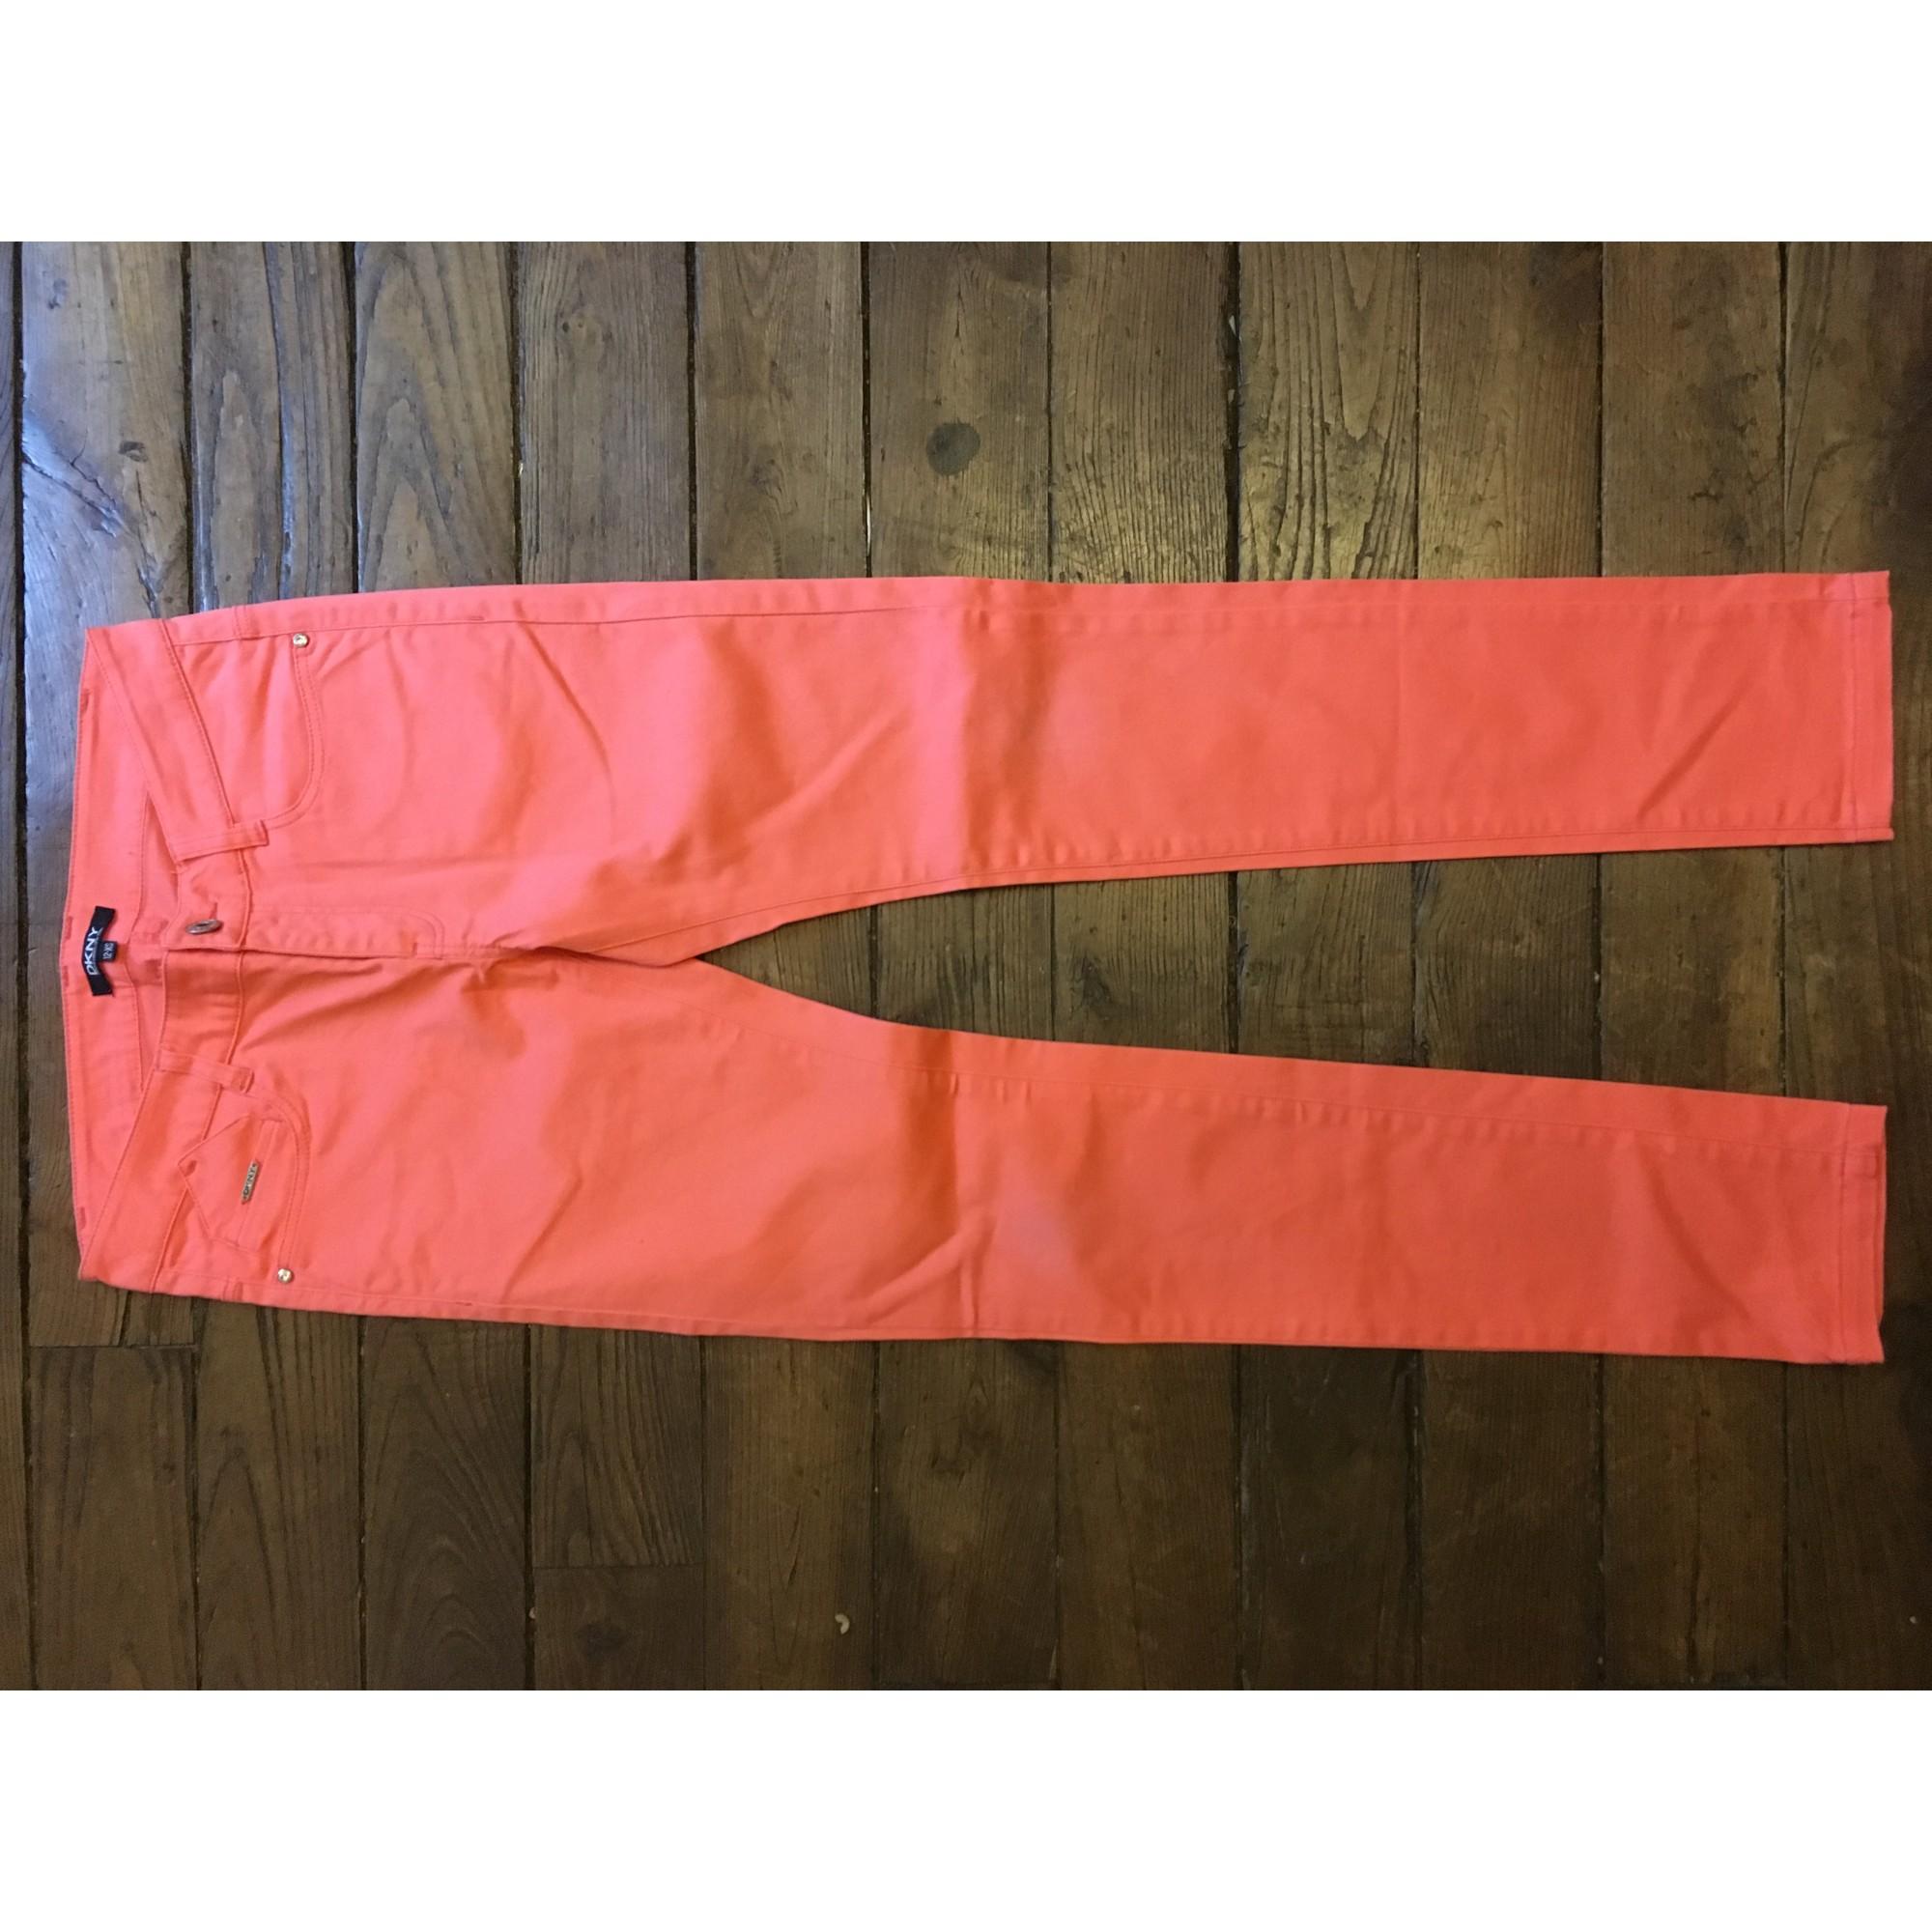 Pantalon DKNY Rose, fuschia, vieux rose